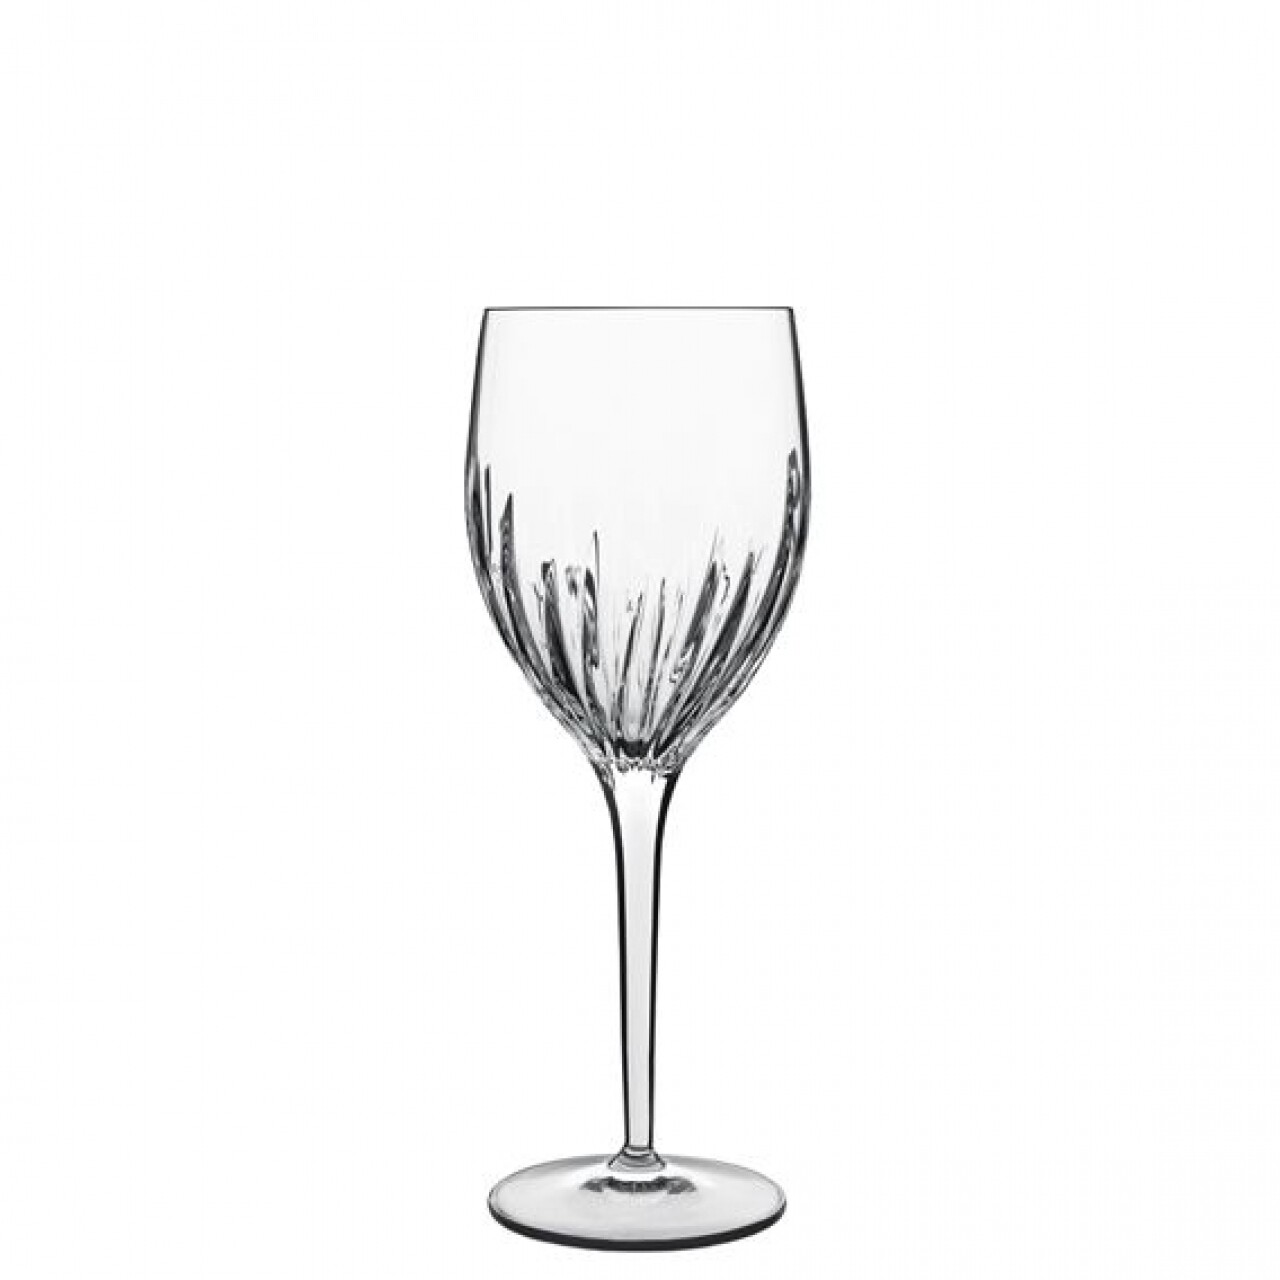 Set 6 pahare vin rosu Incanto, Luigi Bormioli, 384 ml, cristalit, transparent